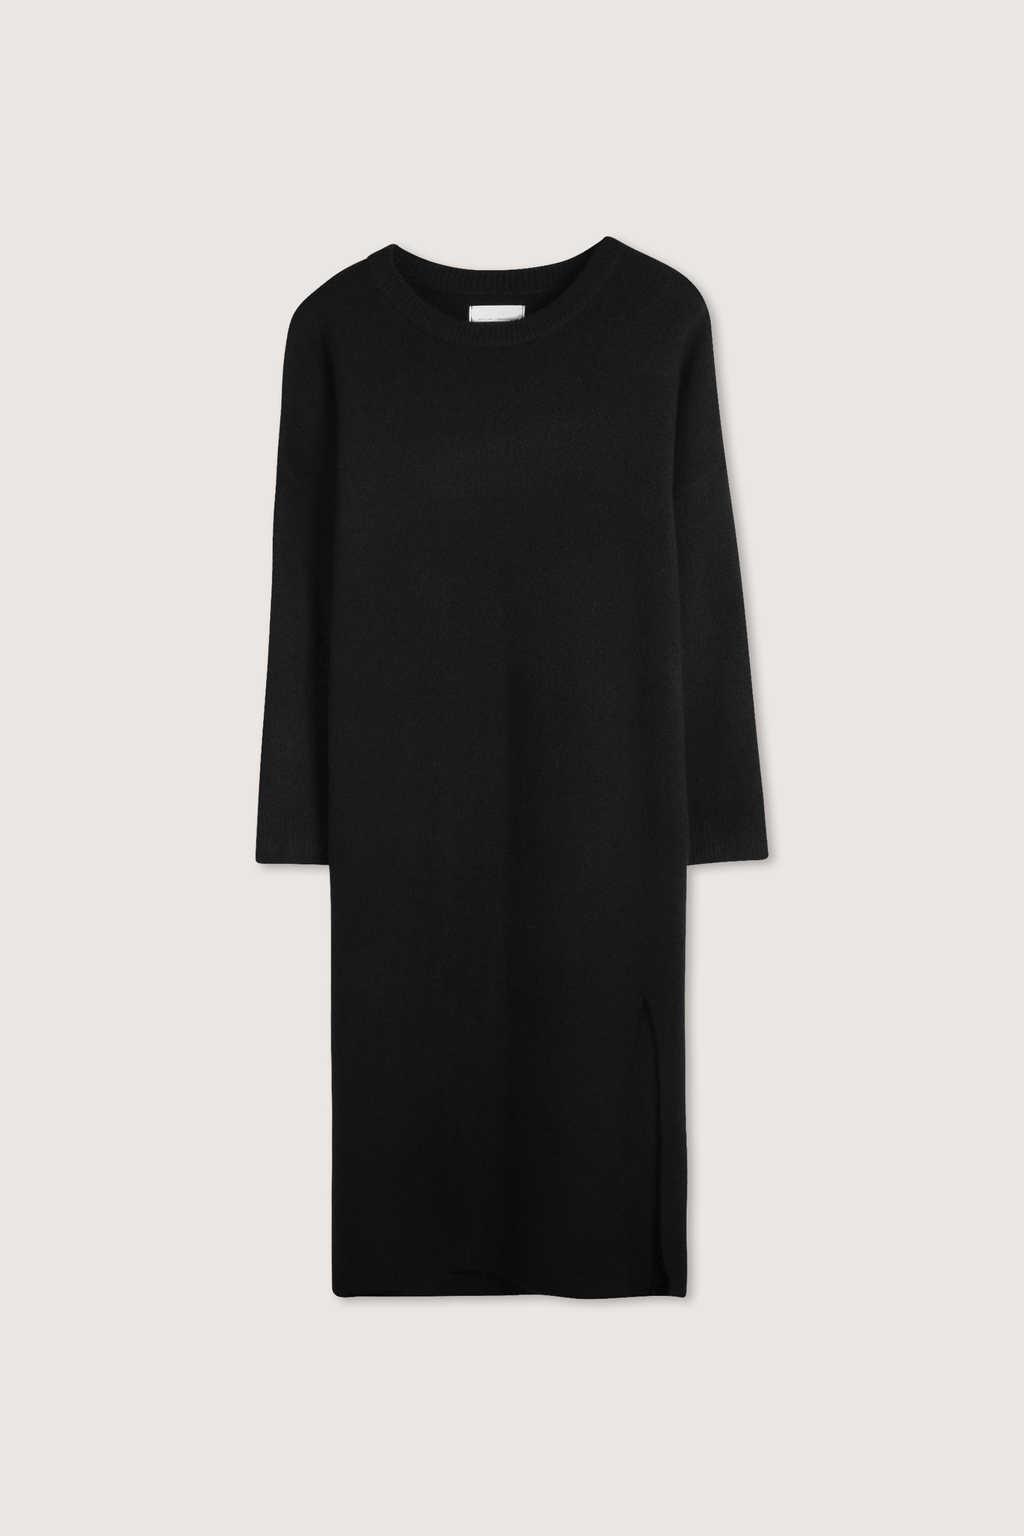 Dress 1648 Black 13